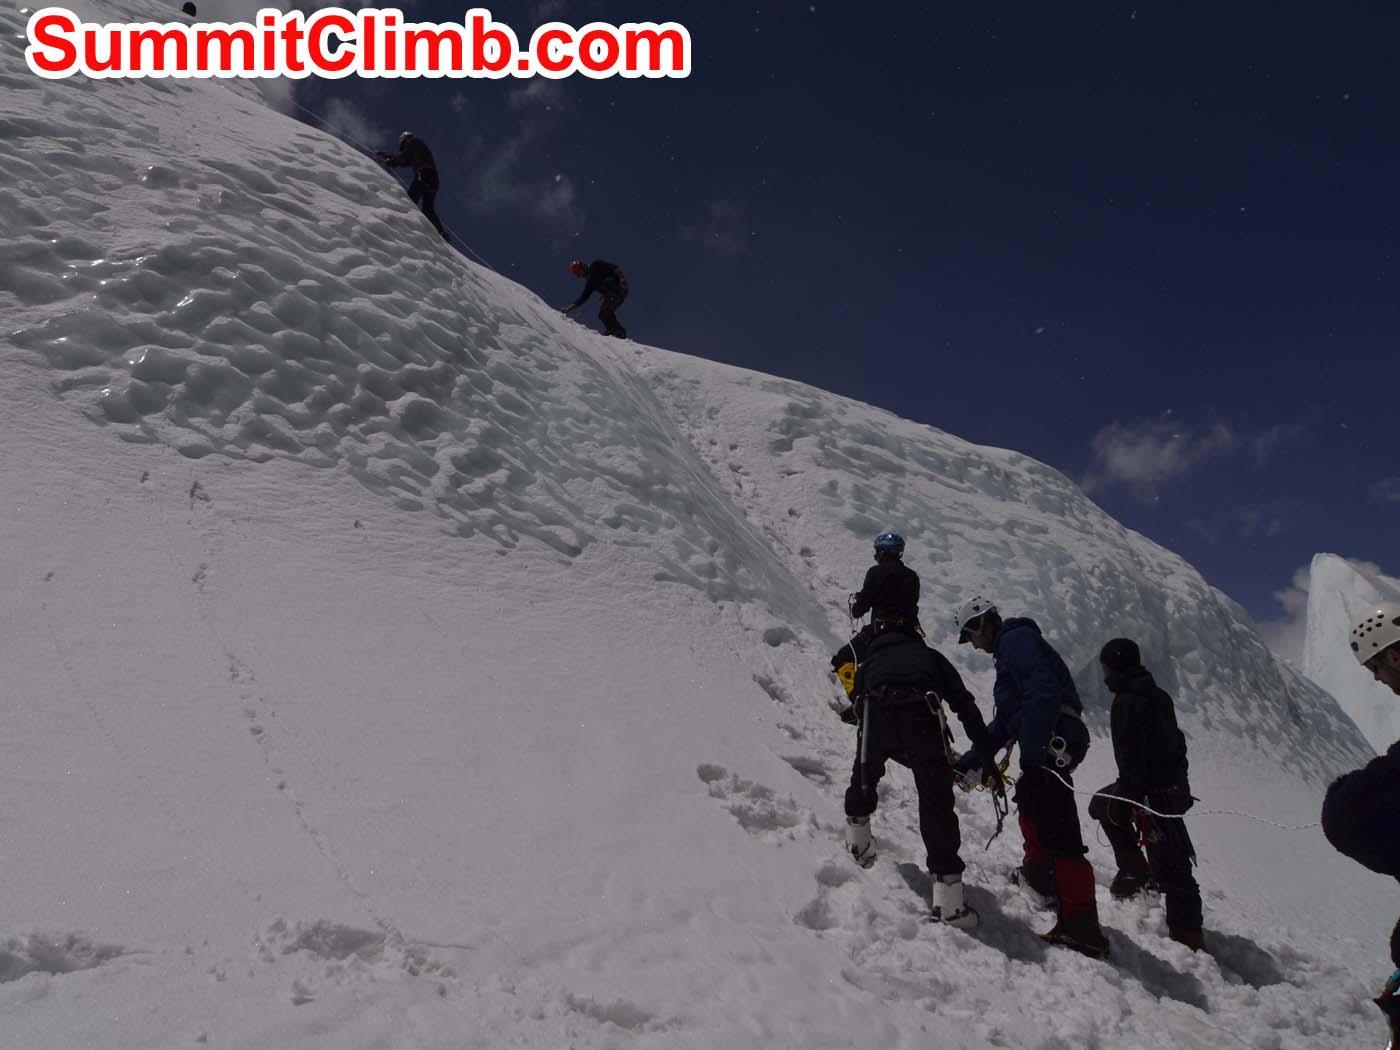 Ice climbing practice at basecamp. Dmitri Nichiporov photo